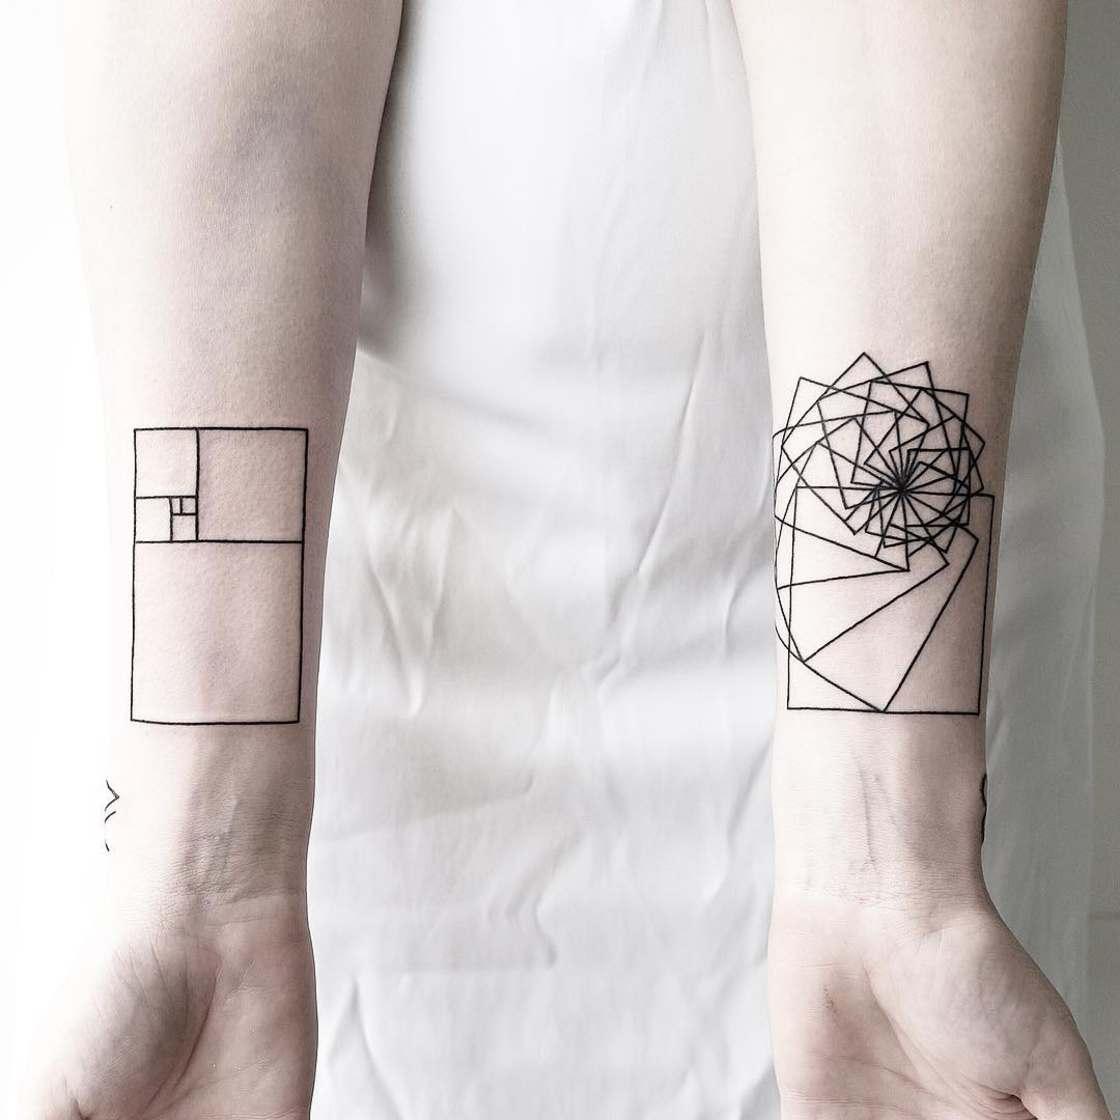 Geometrical & Minimalist Tatoos by Malvina Maria Wisniewska